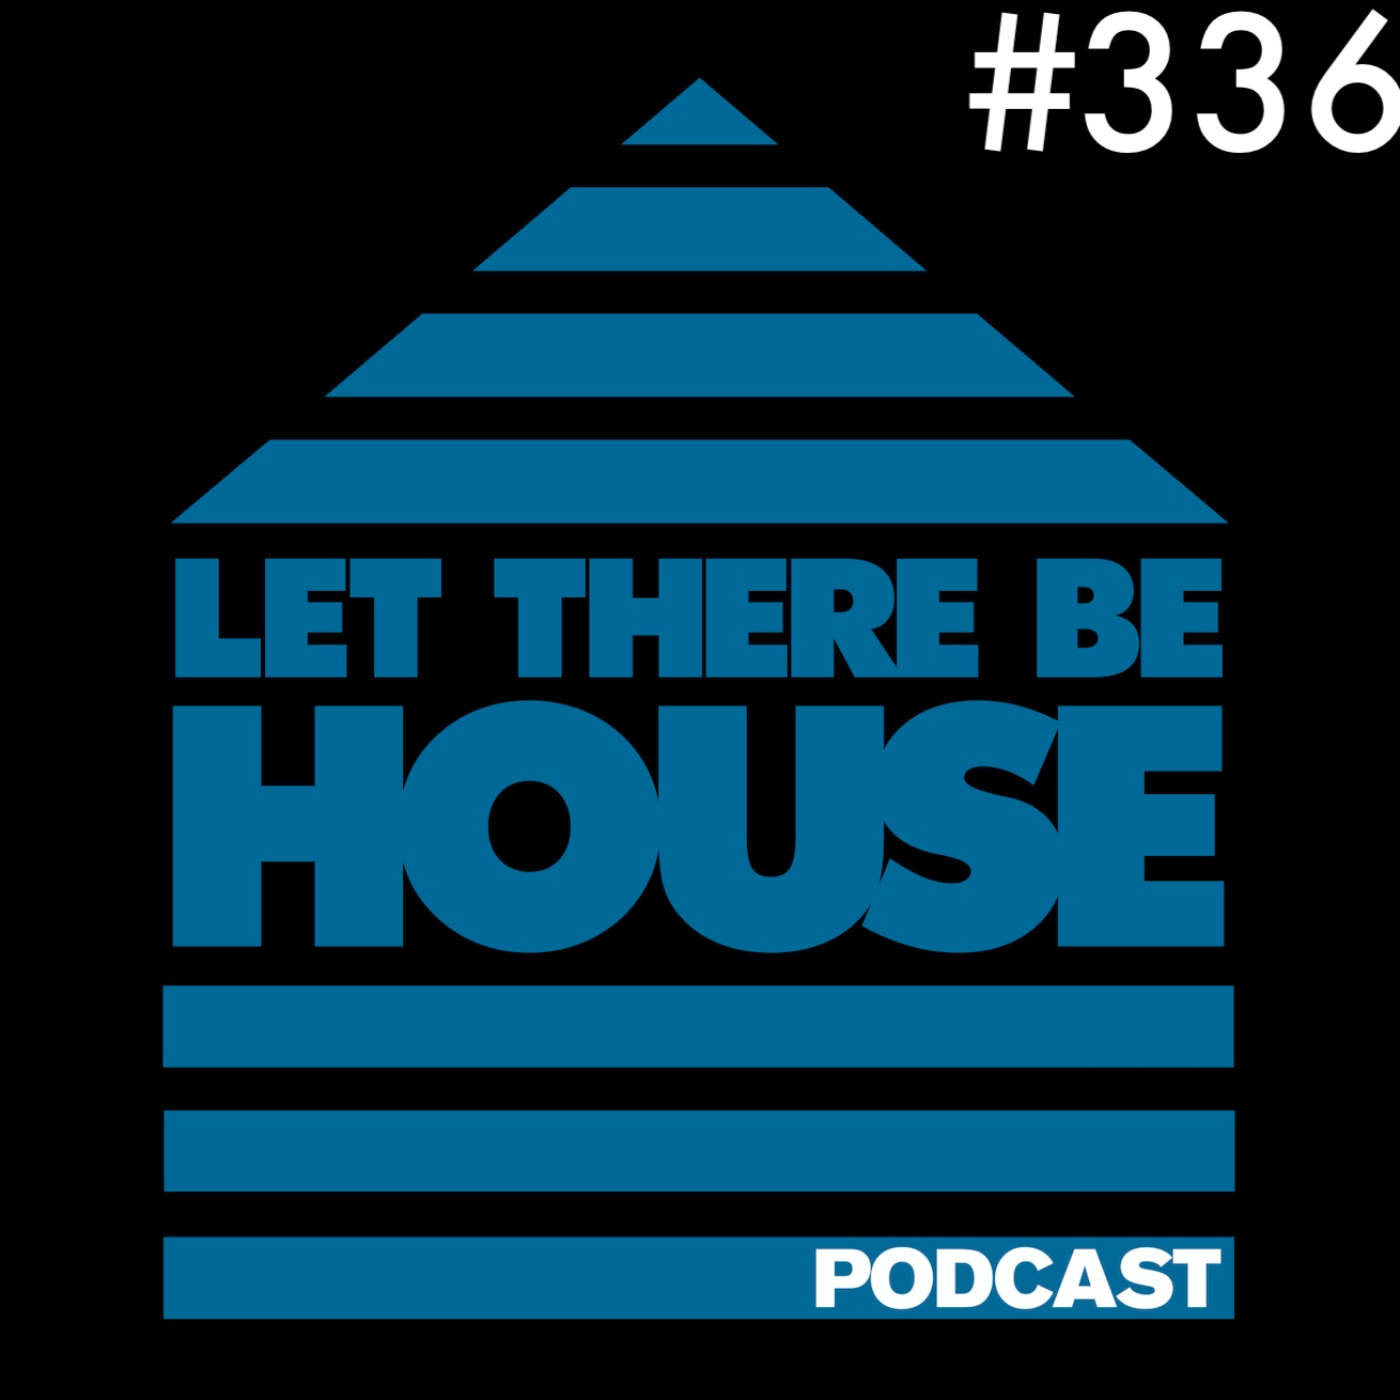 LTBH #336 with Glen Horsborough